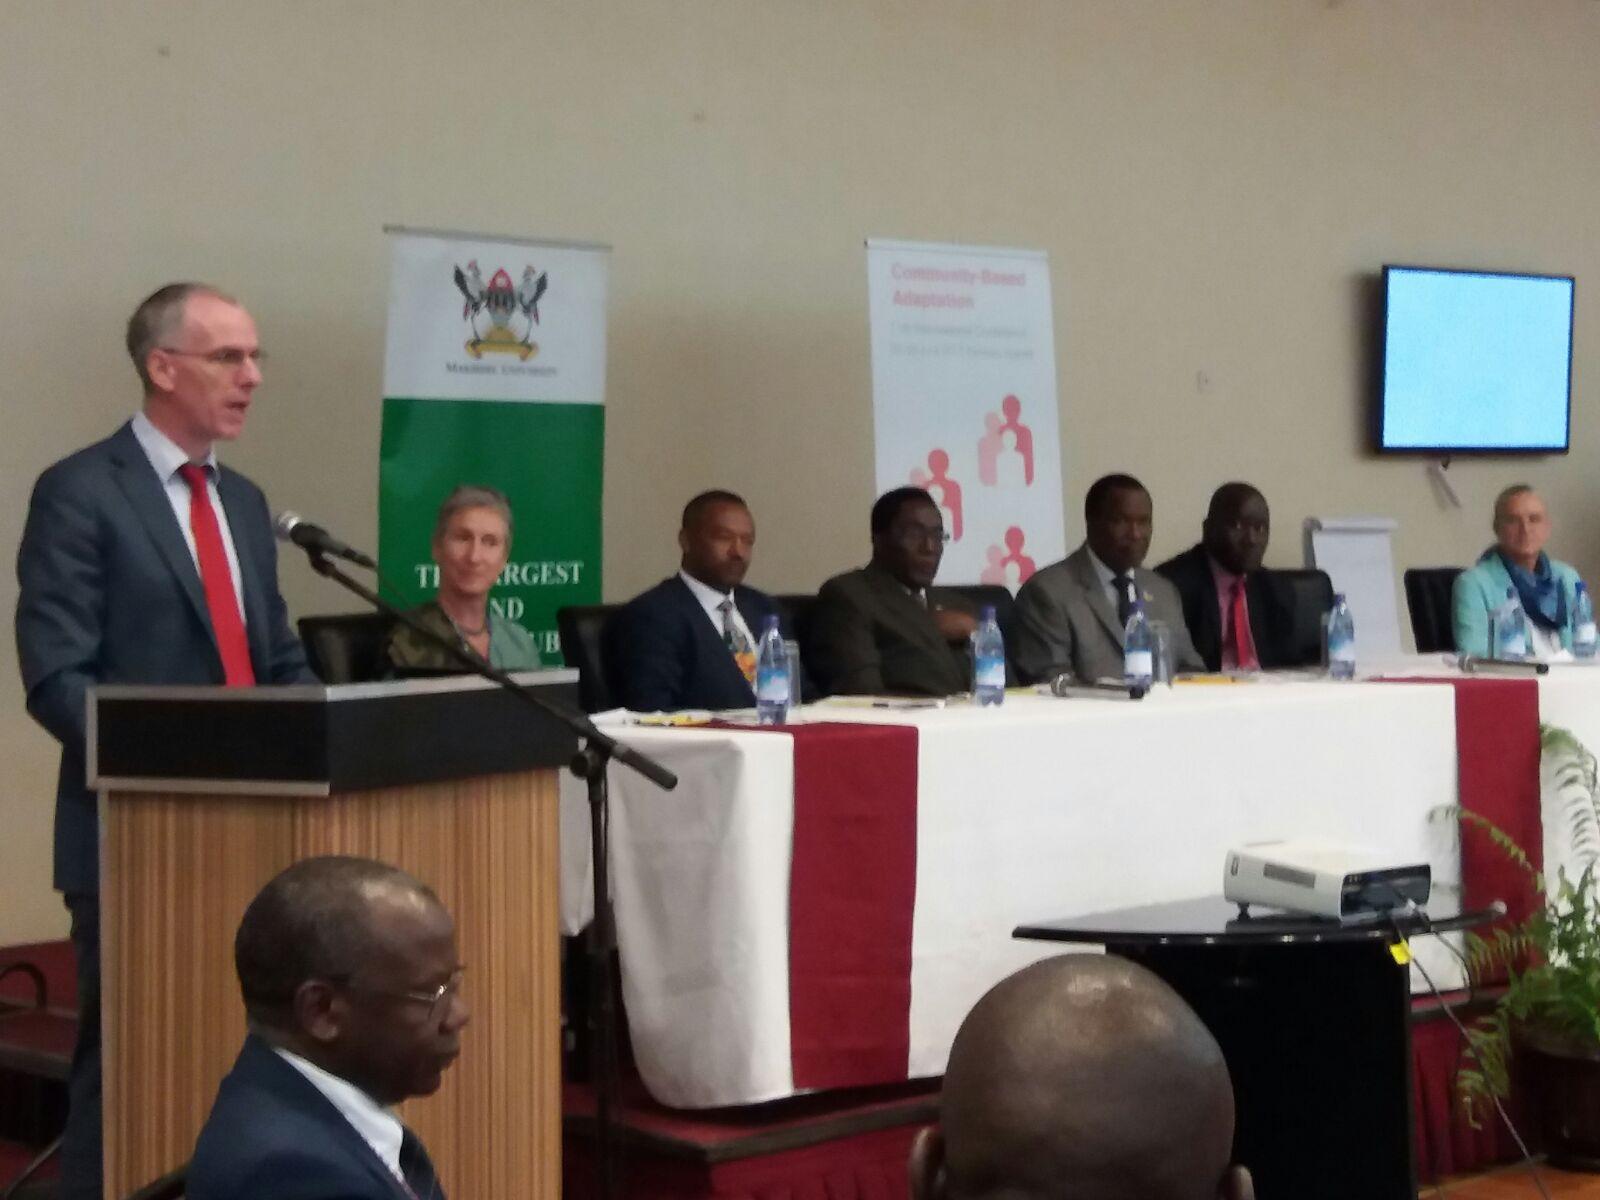 Ambassador @DonalCroninIRL hails Uganda gvt efforts to address CC &  joining of #NDCpartnership & launch of the NAP #CBA11 @IIED @Irish_Aid https://t.co/QwvC5Rm1lN